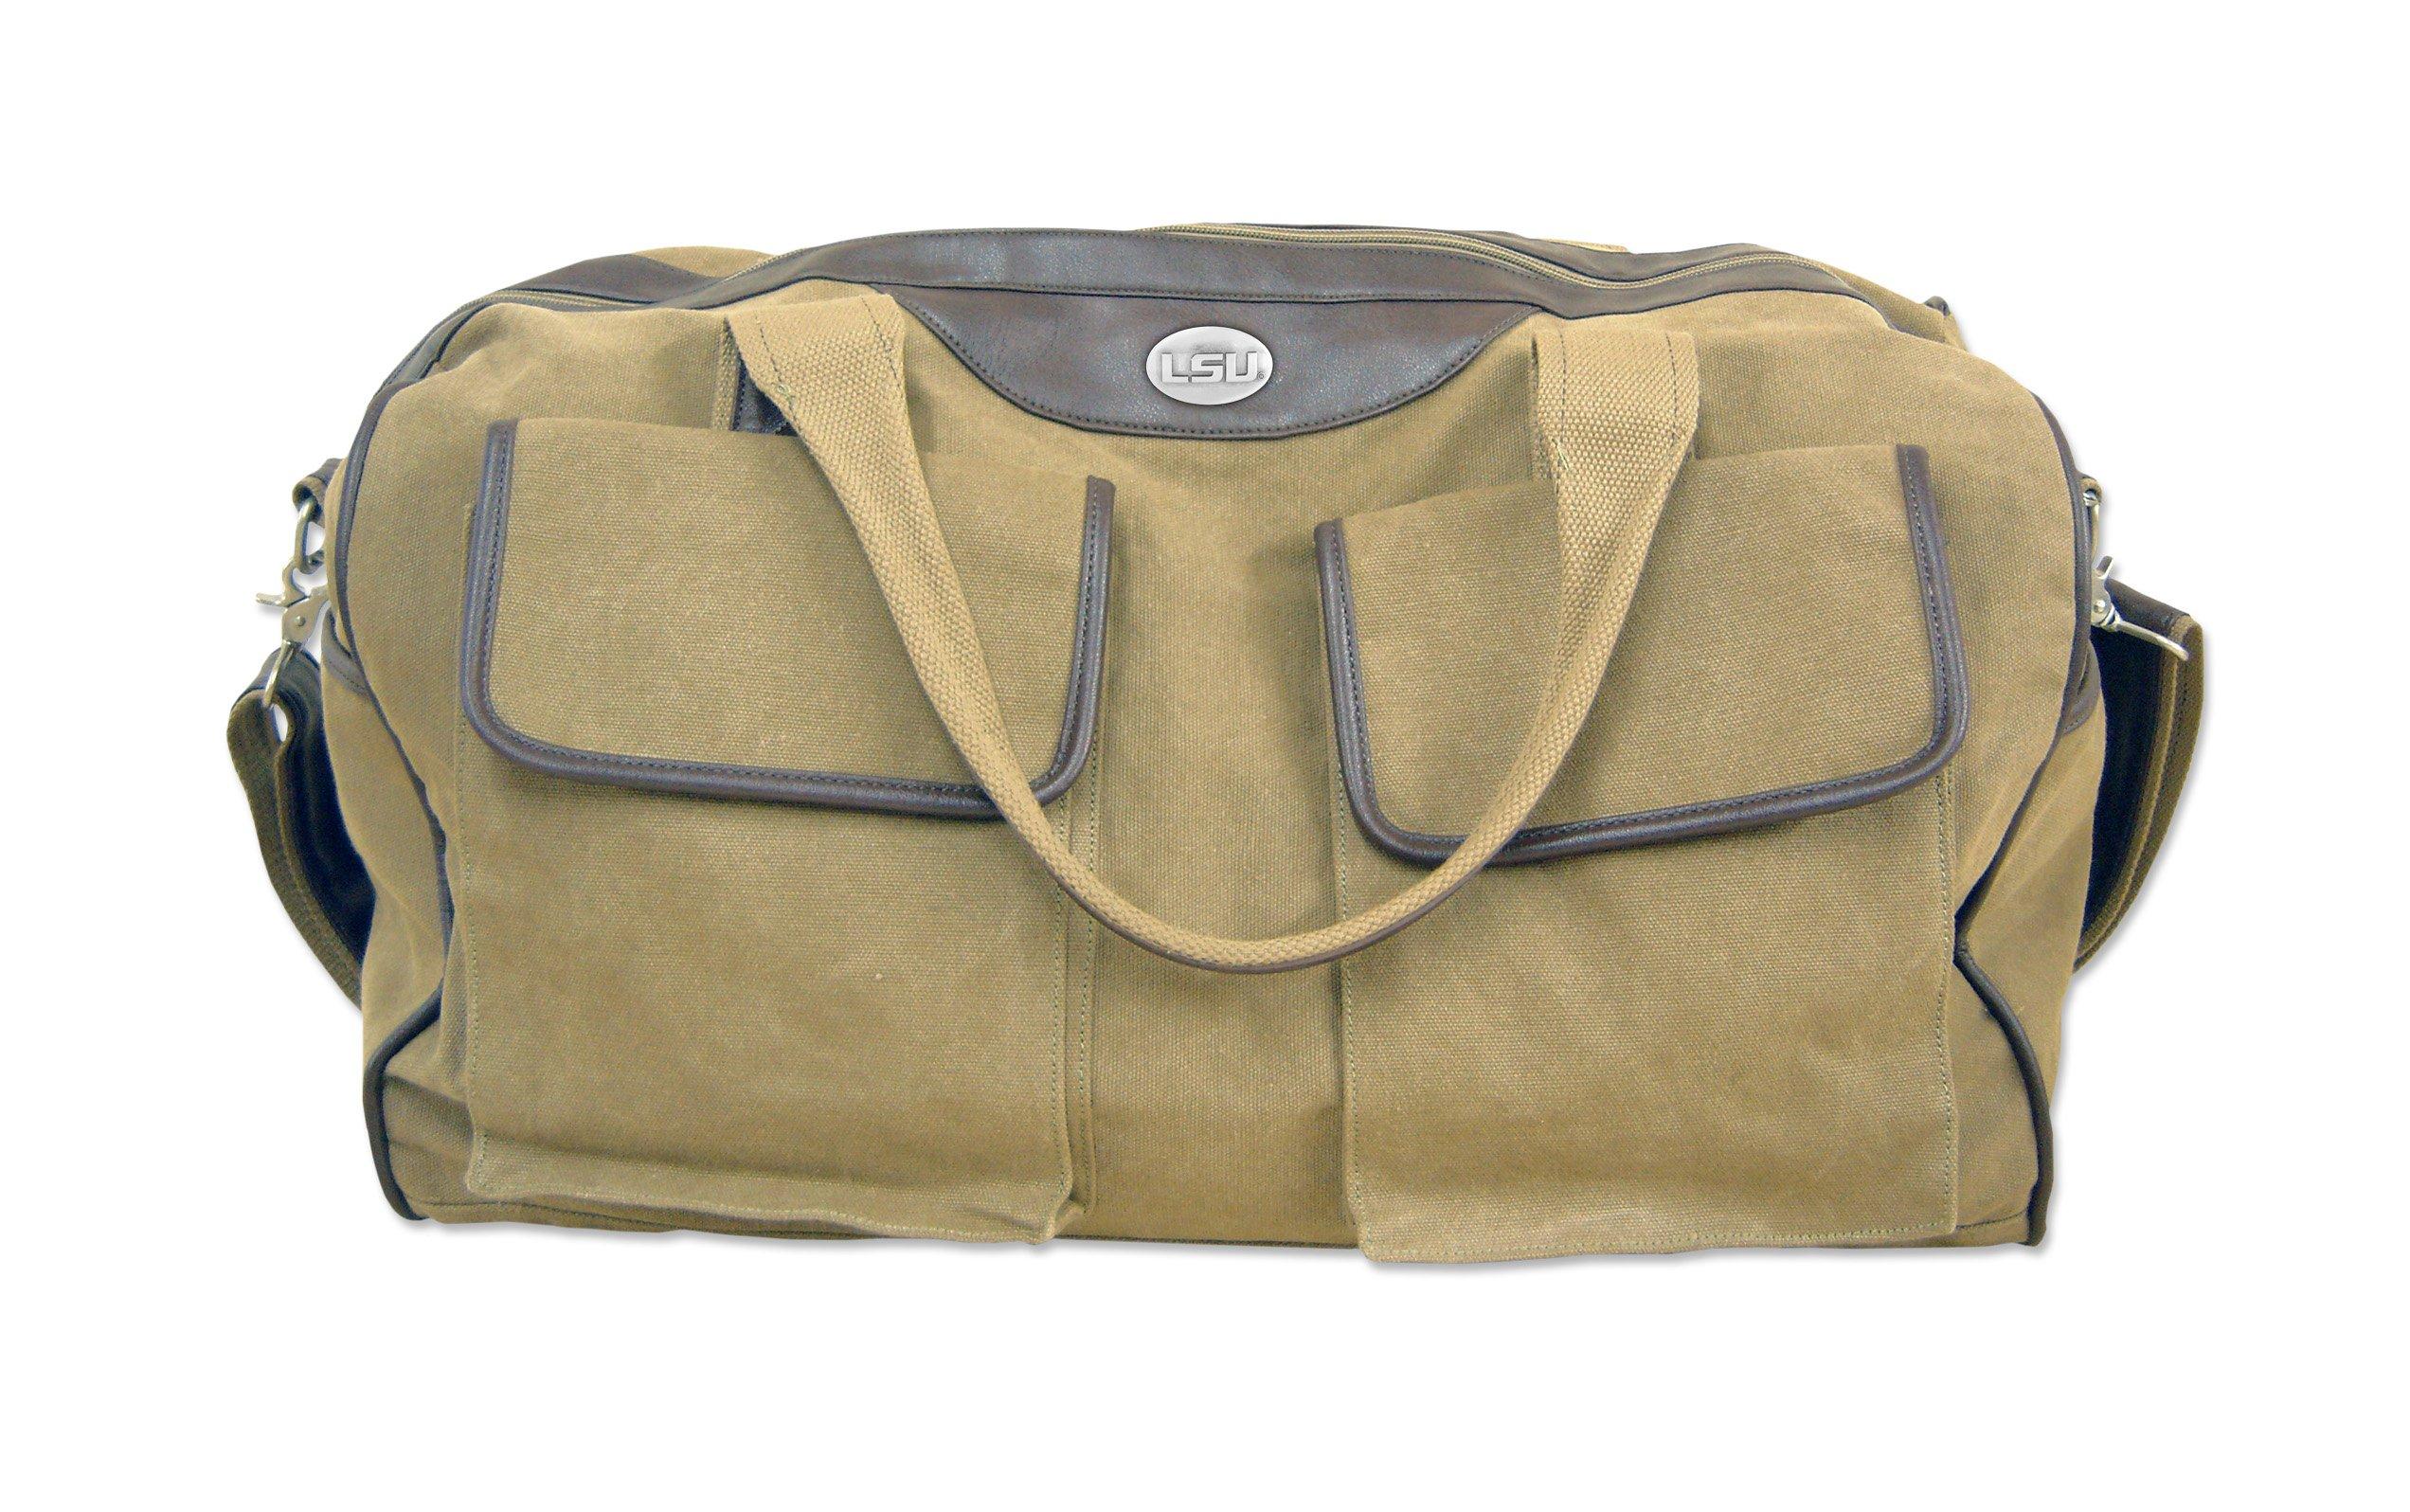 NCAA LSU Tigers Men's Canvas Concho Duffel Bag, Khaki, One Size by ZEP-PRO (Image #1)